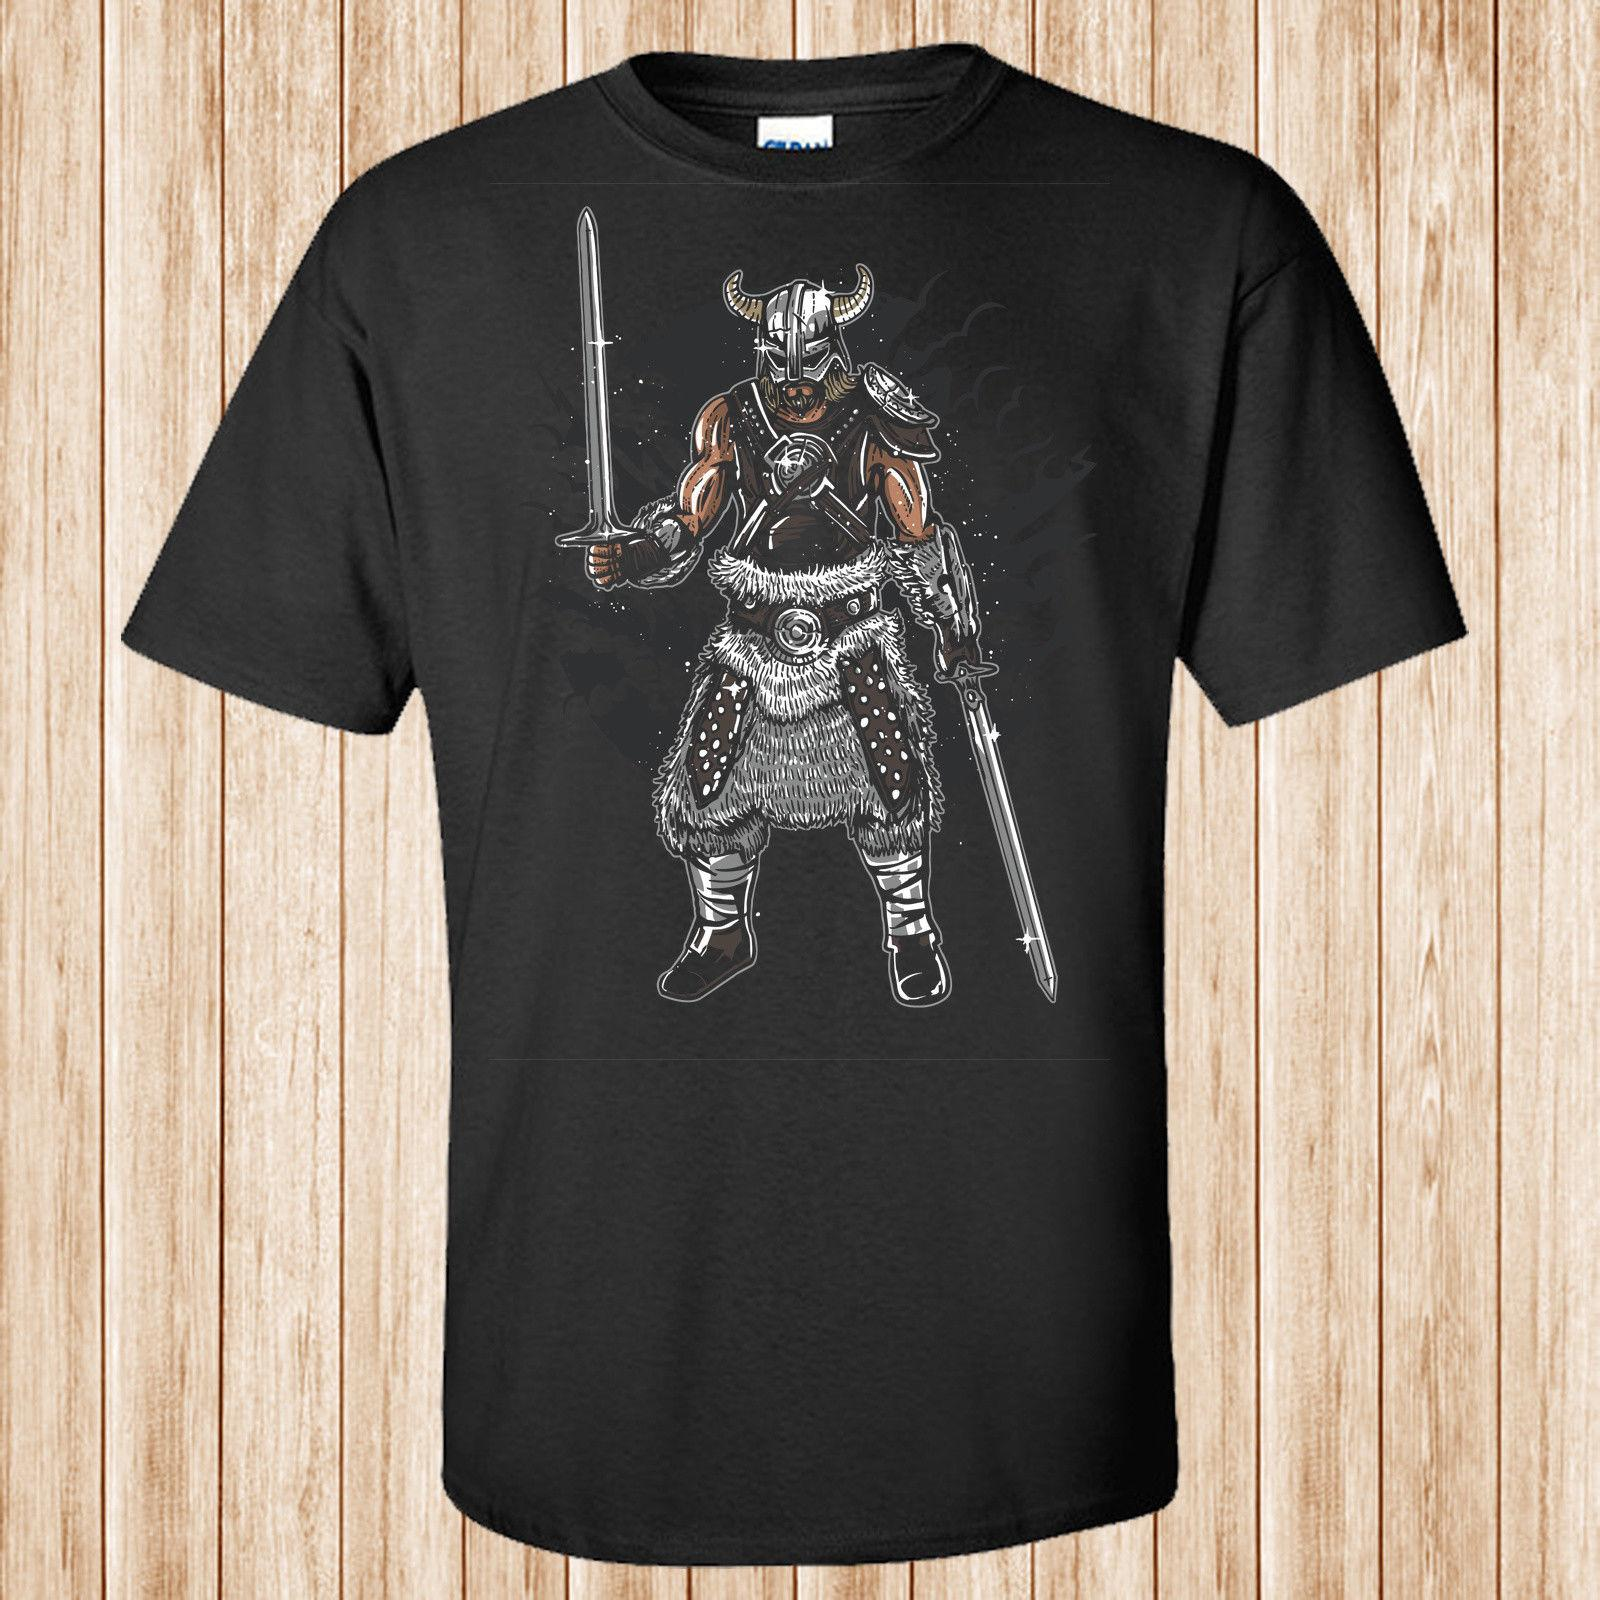 e0876710 Dark Viking T Shirt Funny Unisex Casual Silly T Shirts Interesting T Shirts  From Cheznobody, $12.96| DHgate.Com